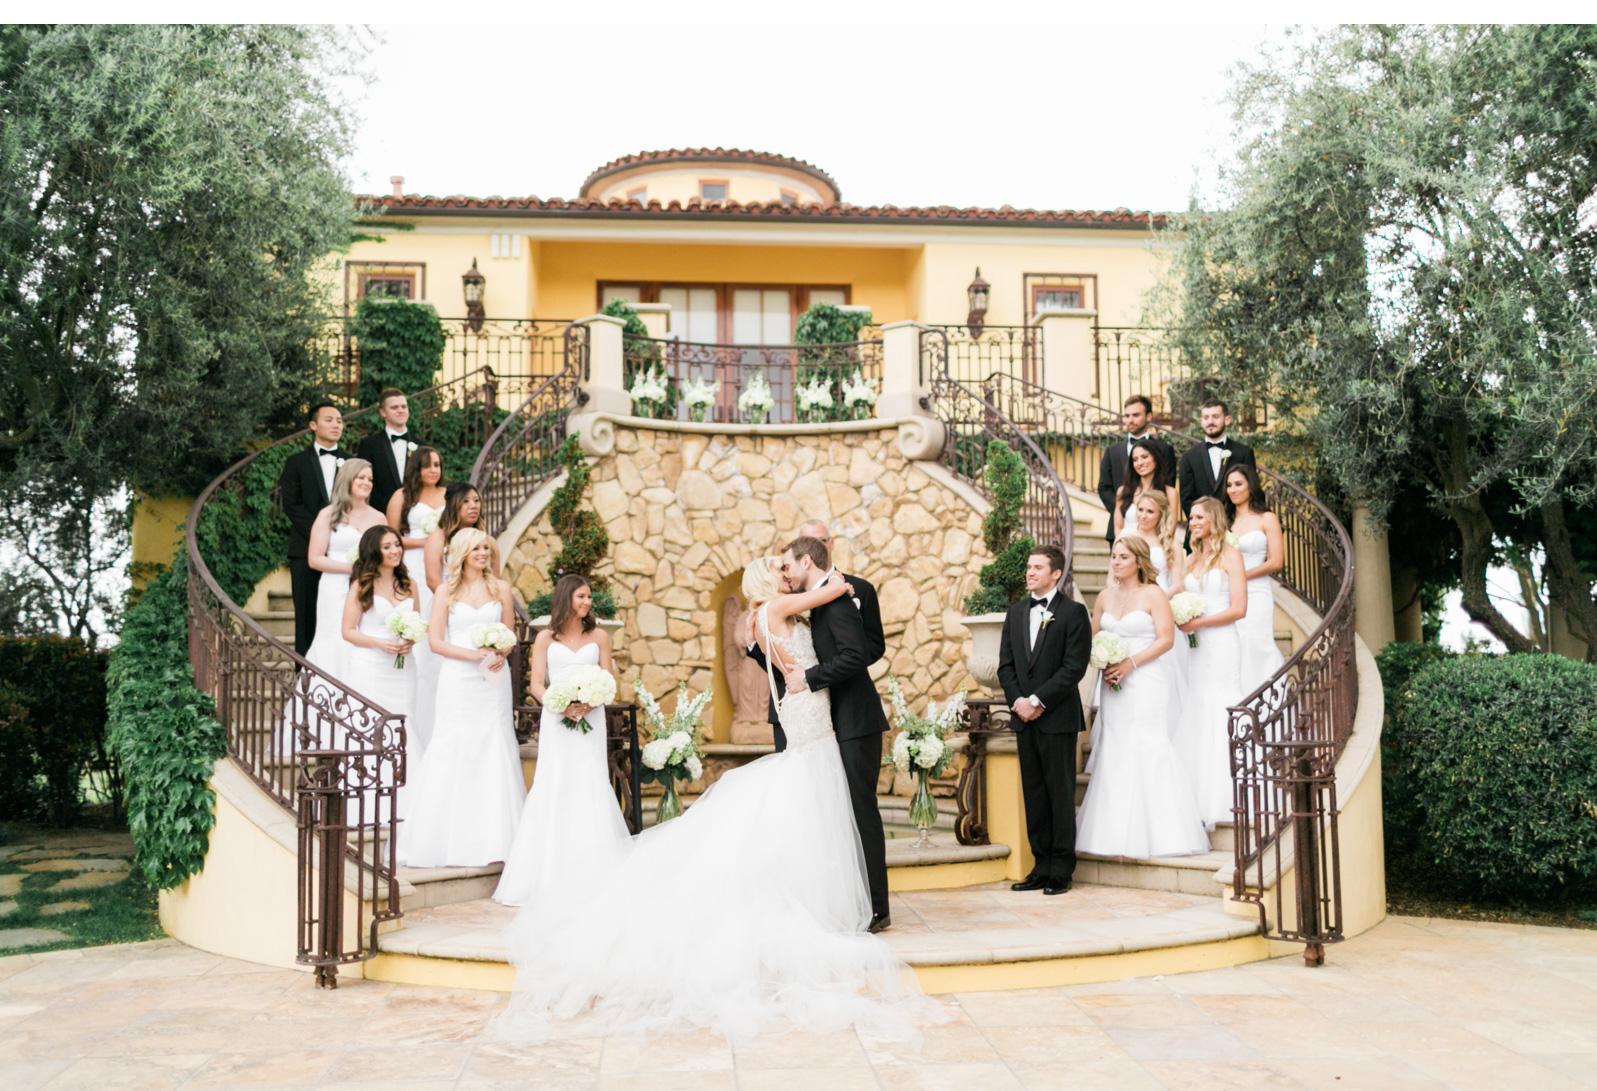 Southern-California-Wedding-Photographer-Natalie-Schutt-Photography_26.jpg